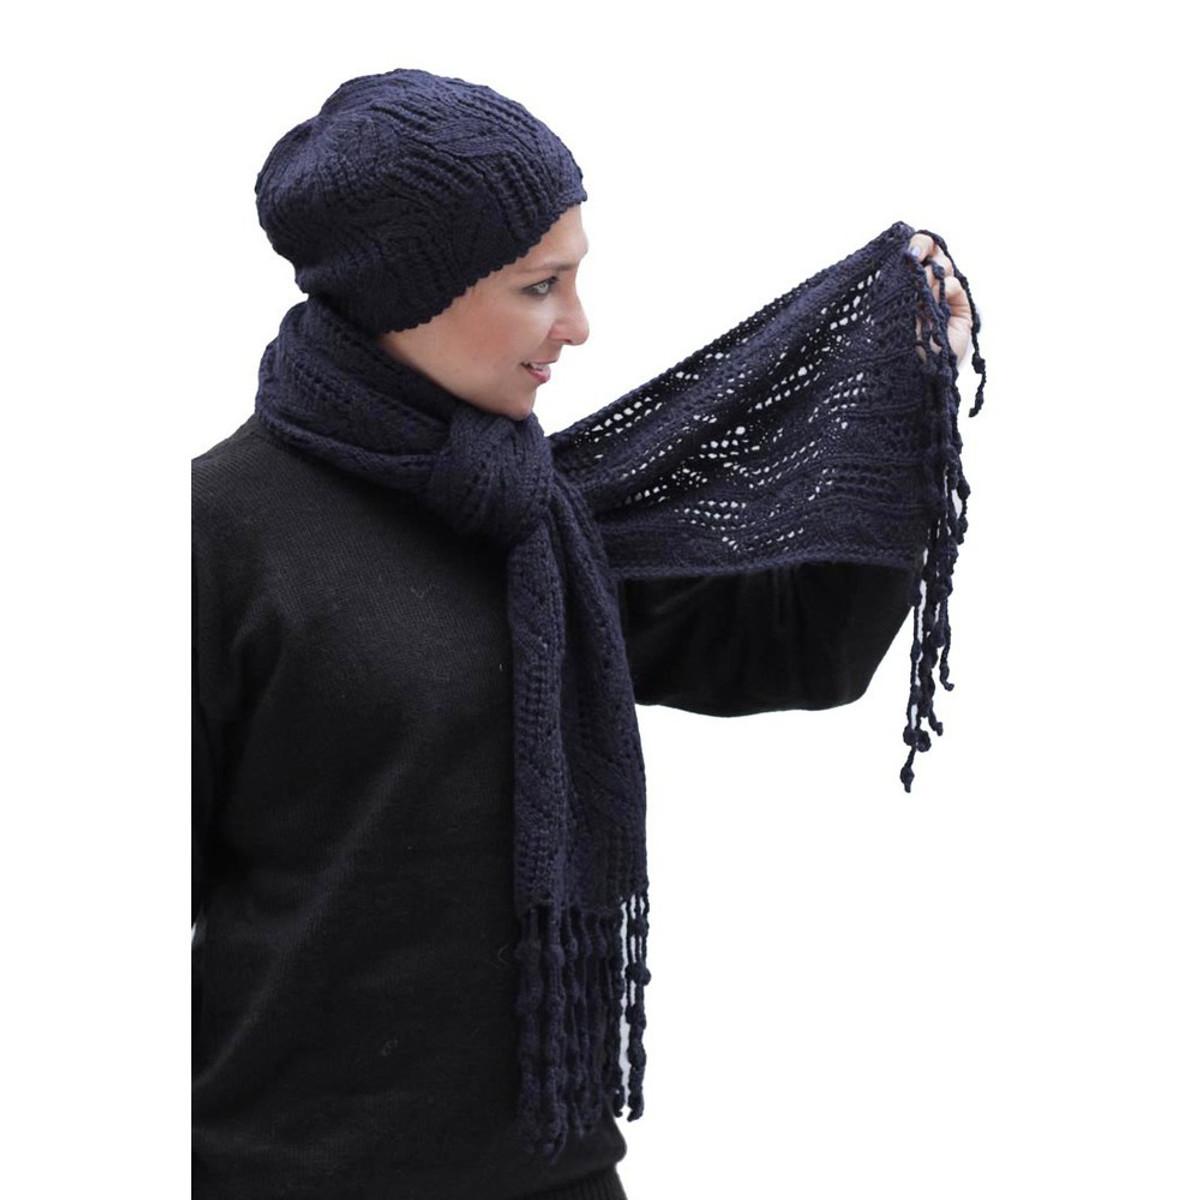 ff076477 Superfine Hand Knitted Alpaca Wool Beanie Hat & Chunky Scarf Navy Blue